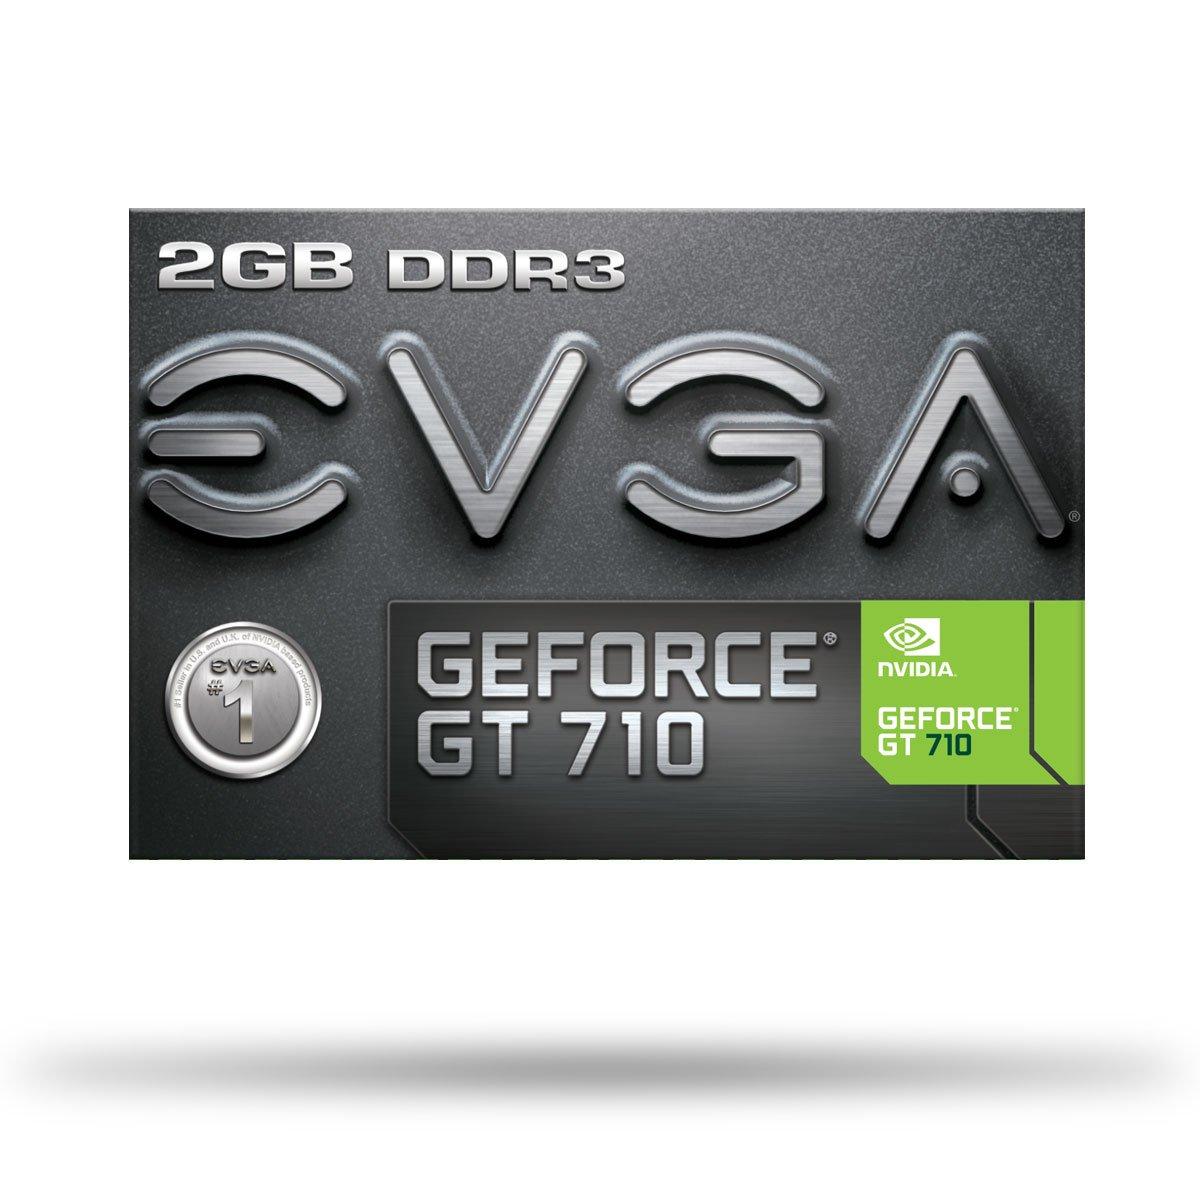 EVGA GT 710 2GB DDR3 64bit Single Slot, Dual DVI 02G-P3-2717-KR by EVGA (Image #8)